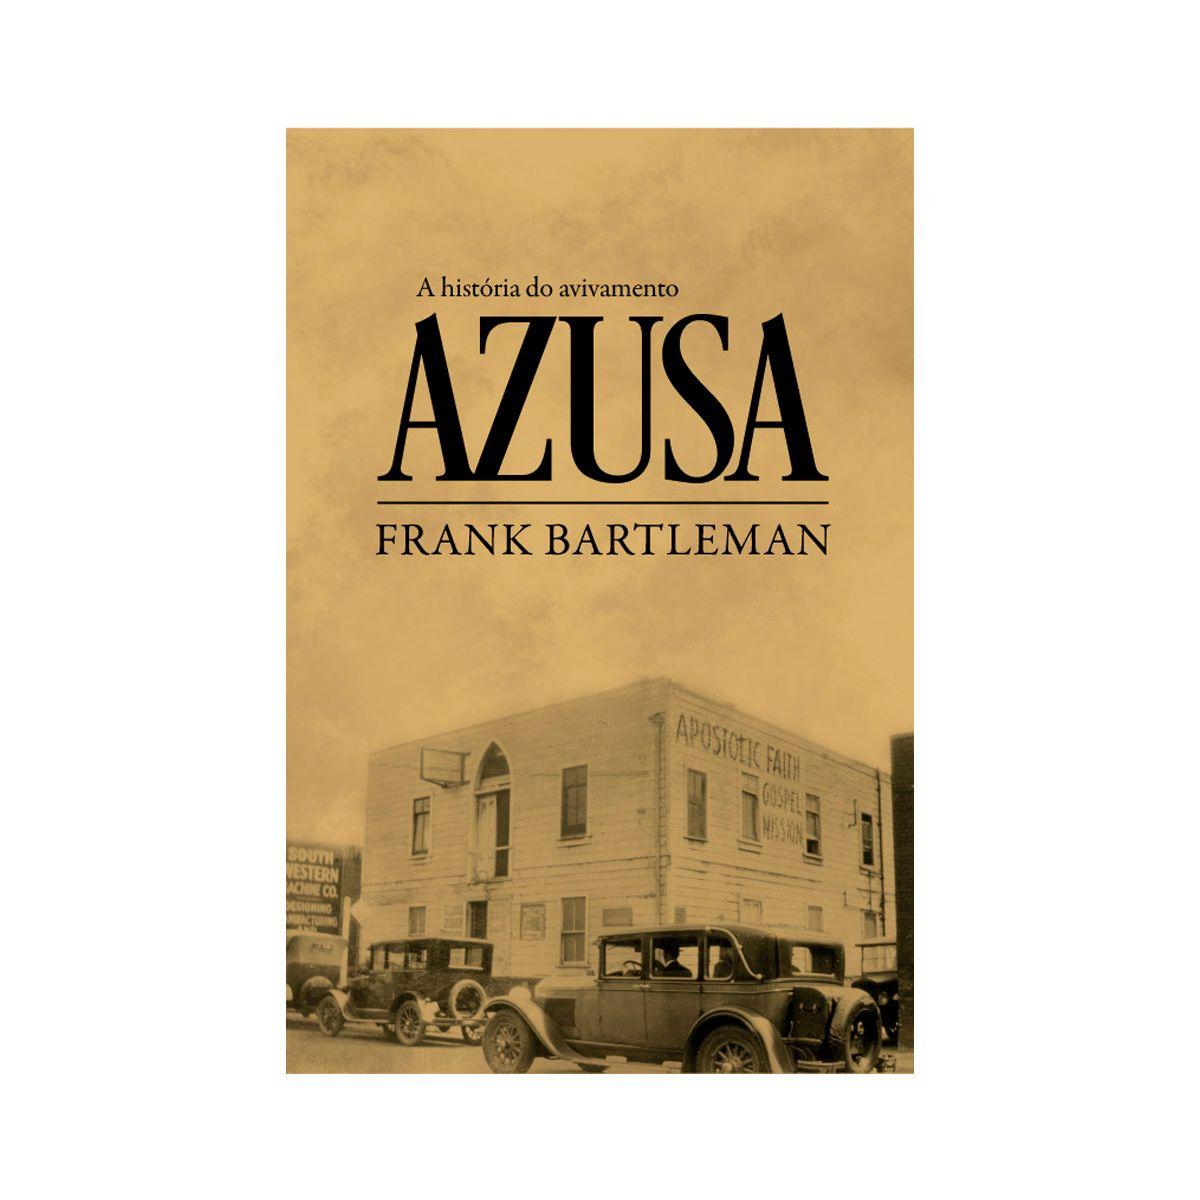 A HISTÓRIA DO AVIVAMENTO AZUSA - Frank Bartleman  - Jesuscopy